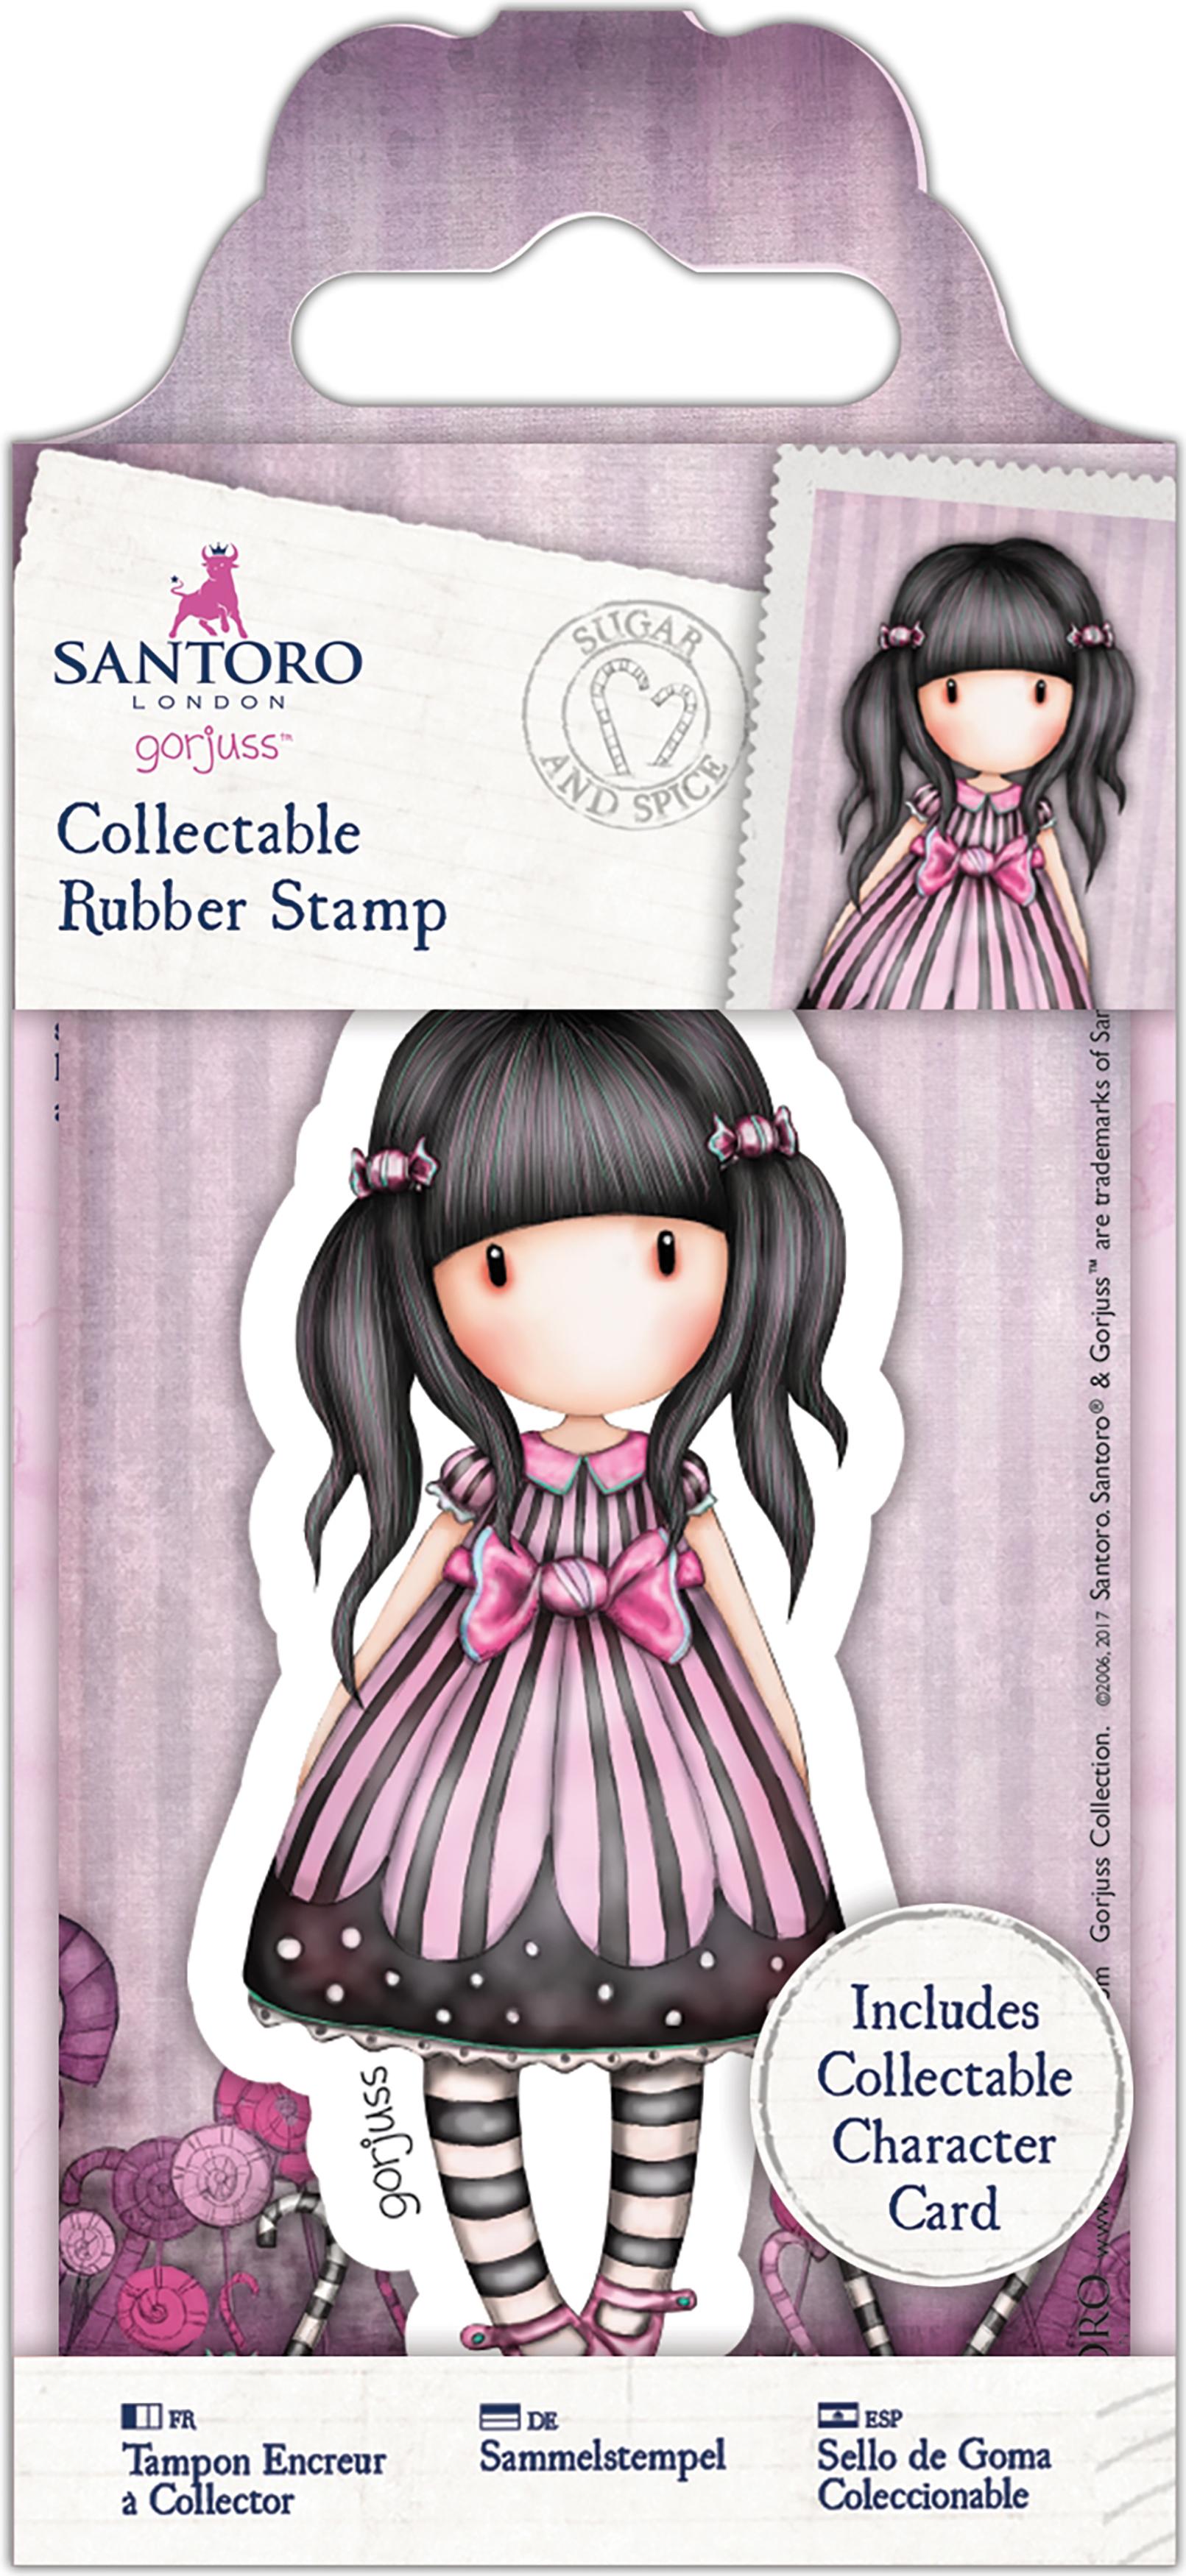 Santoro's Gorjuss Rubber Stamp-No